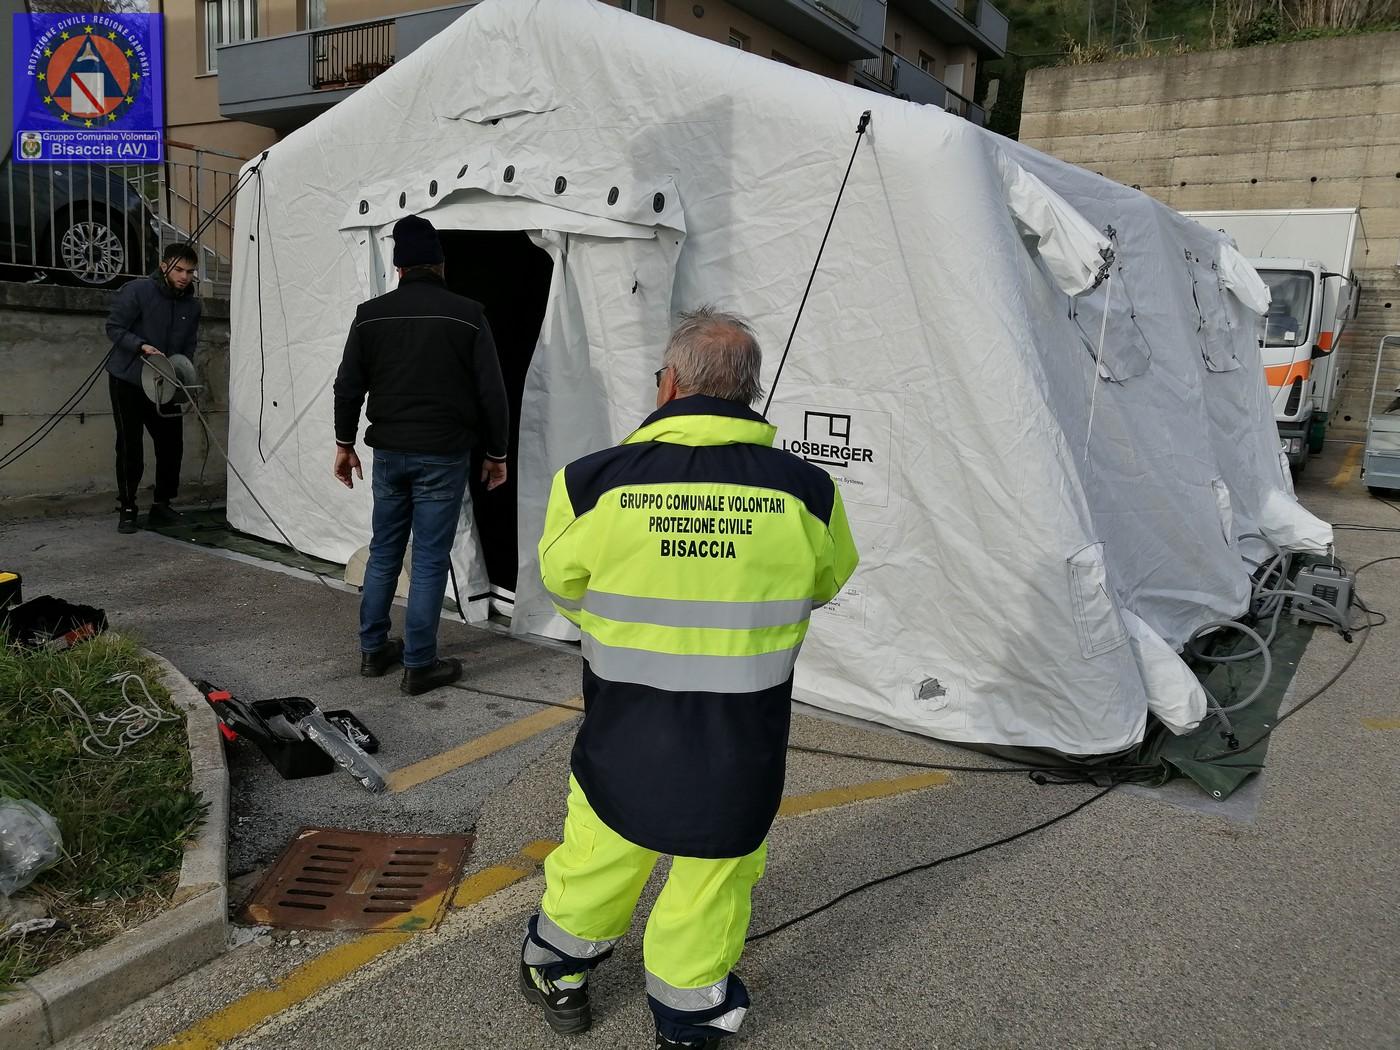 Tenda Ariano GCVPC Bisaccia 2